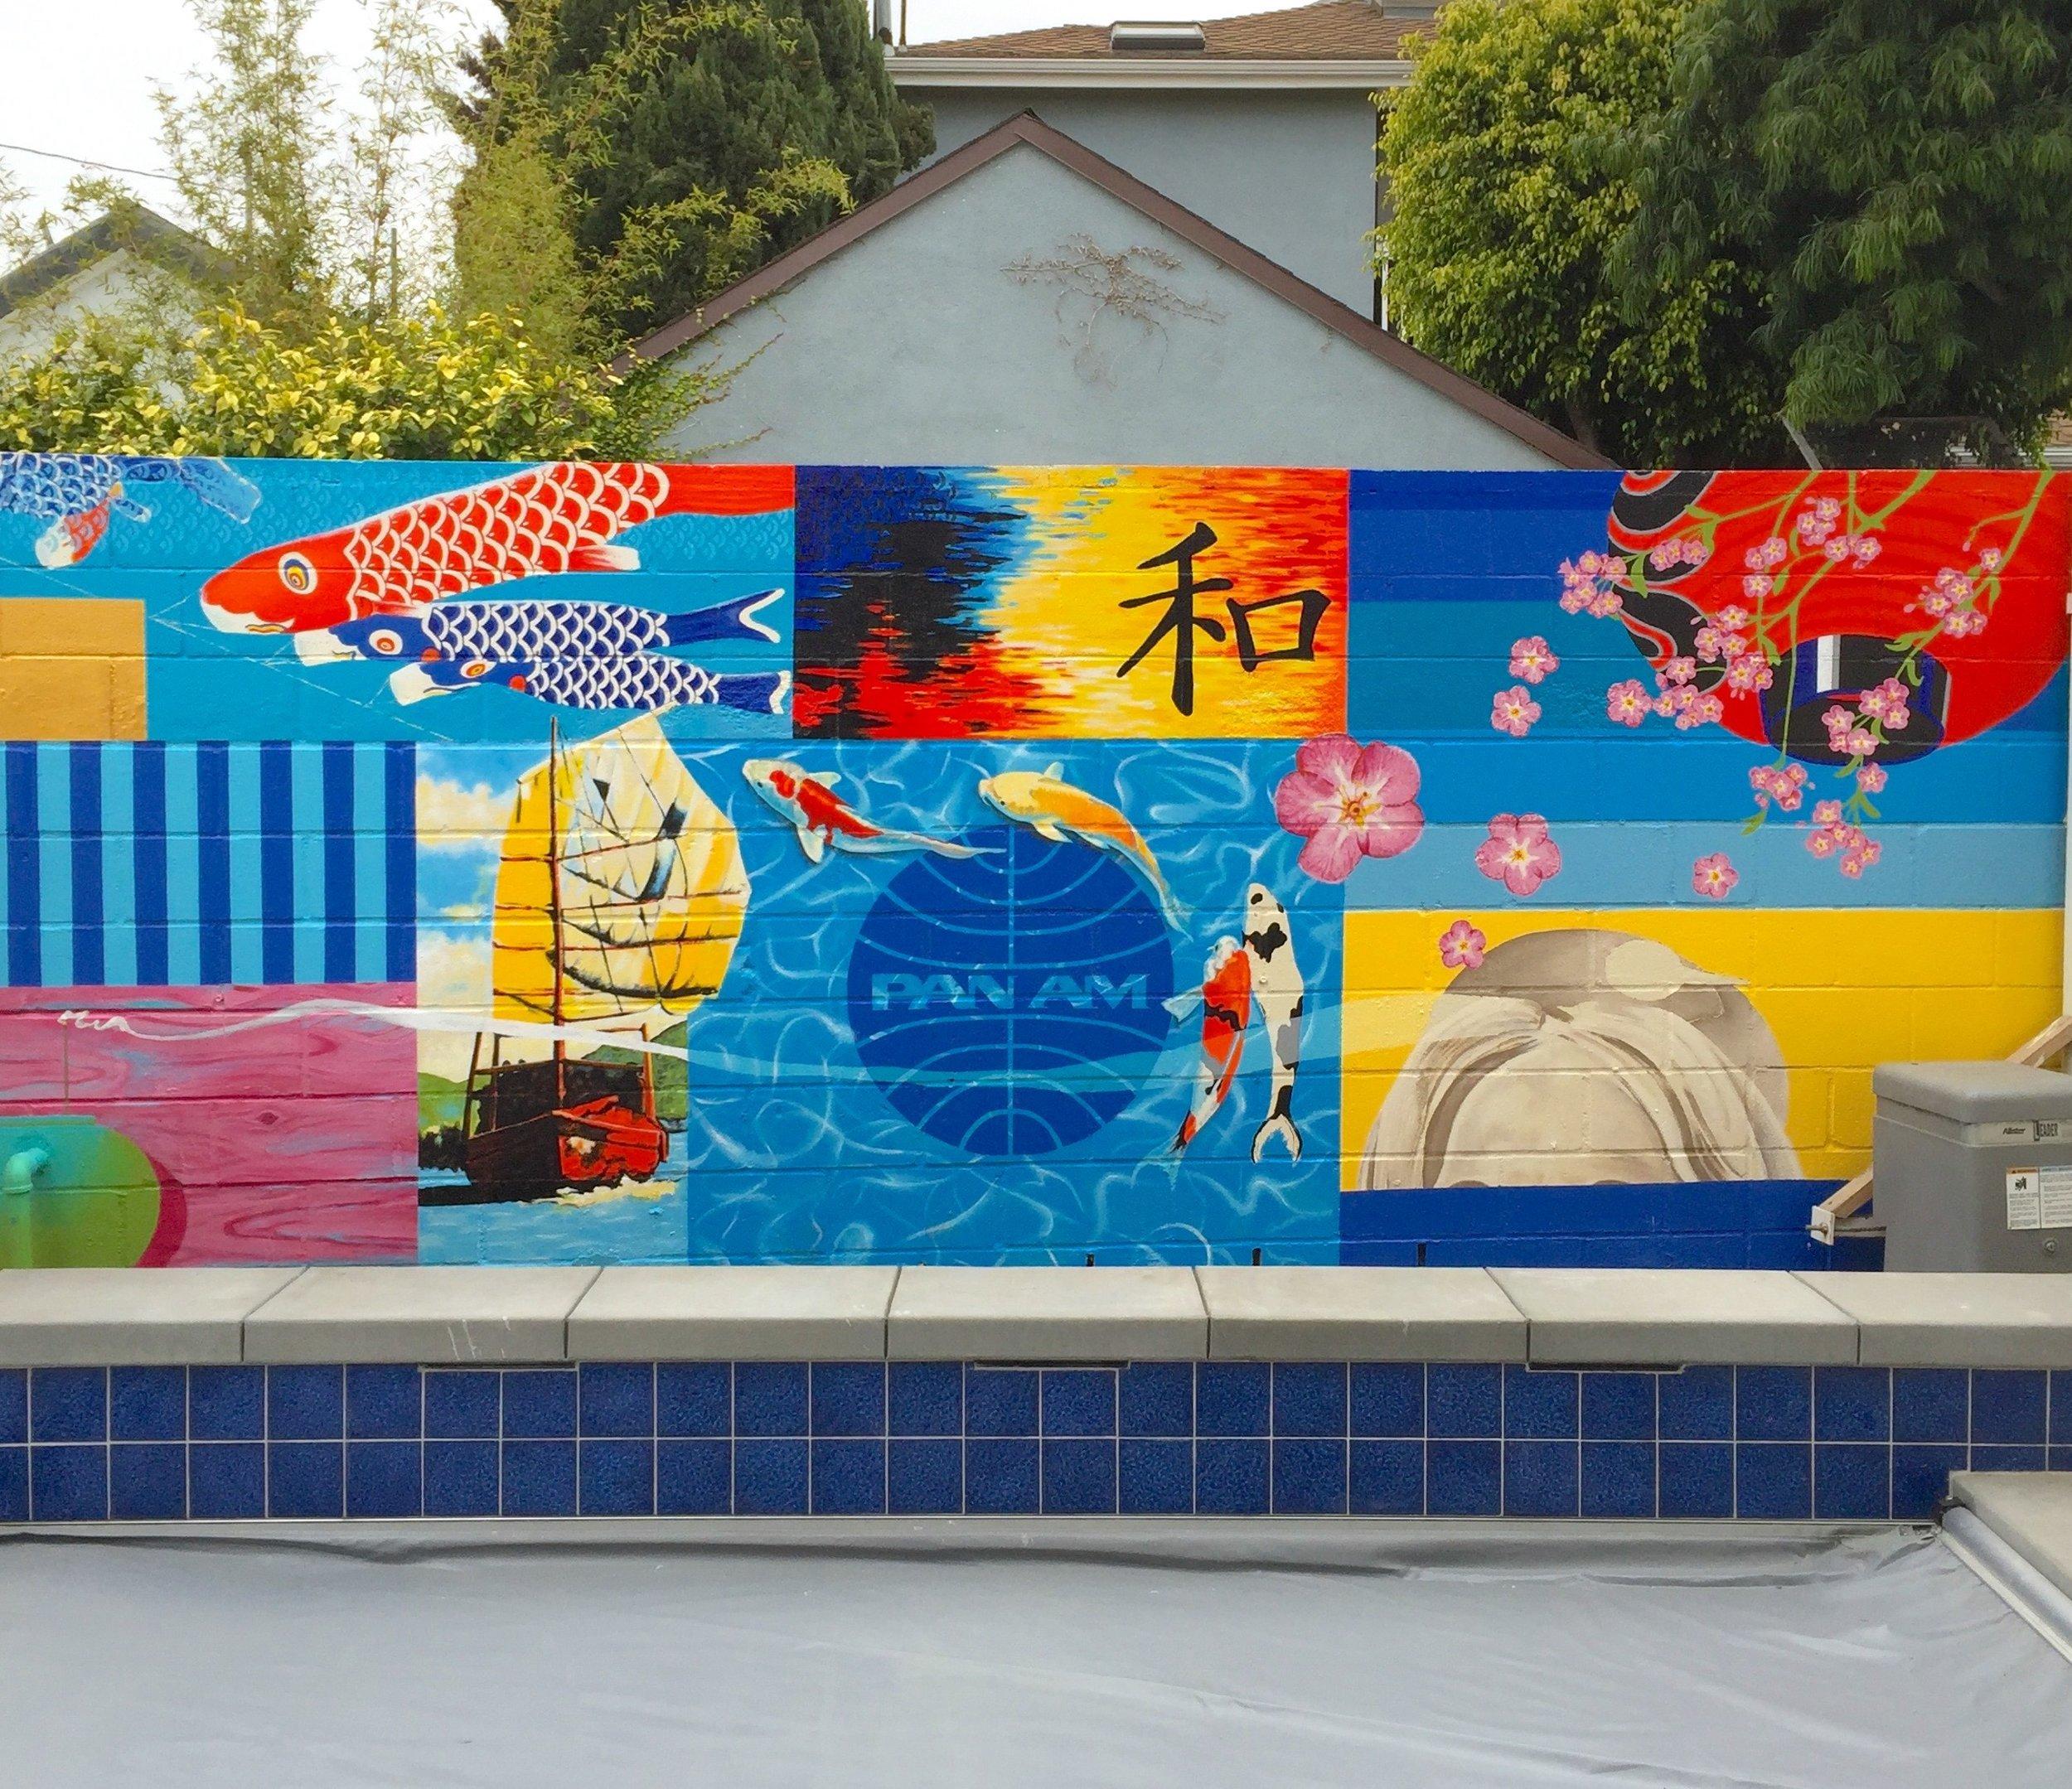 Private residence, Marina del rey, California